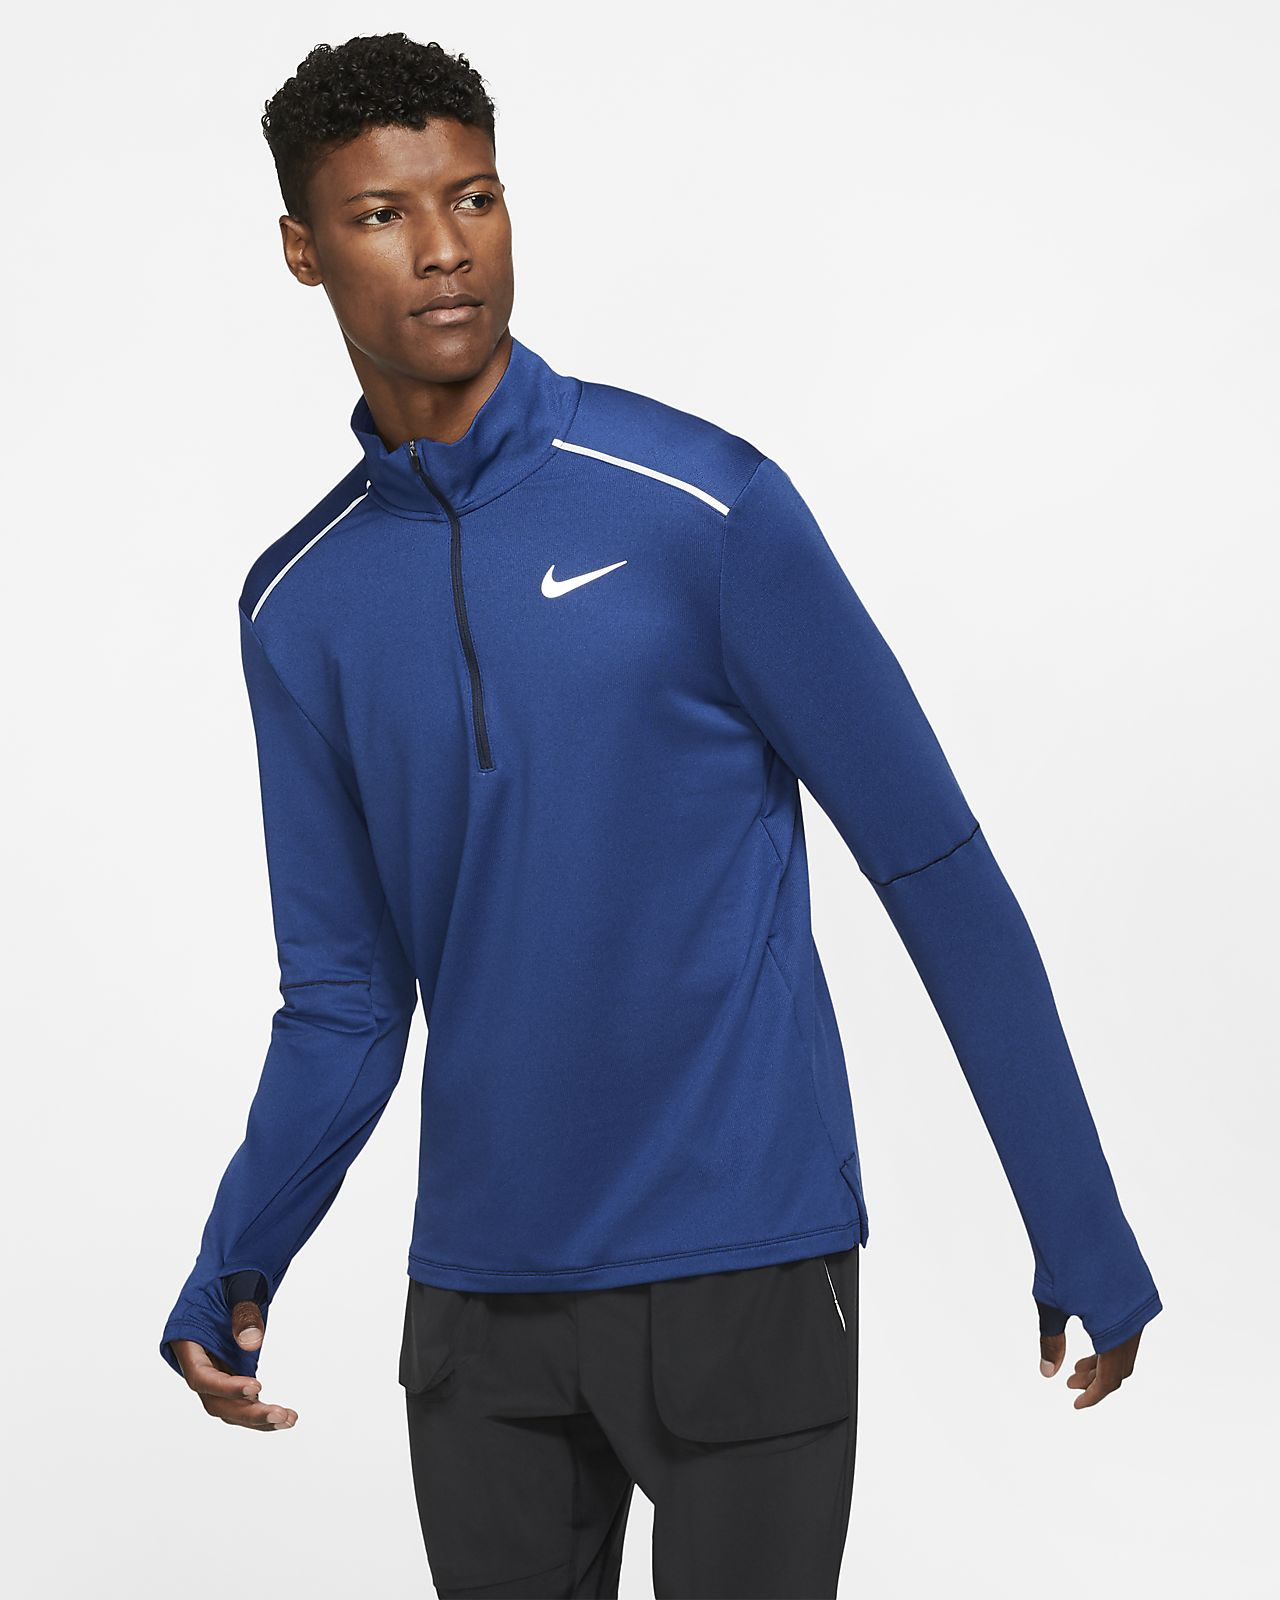 Prenda superior de running de medio cierre para hombre Nike Element 3.0